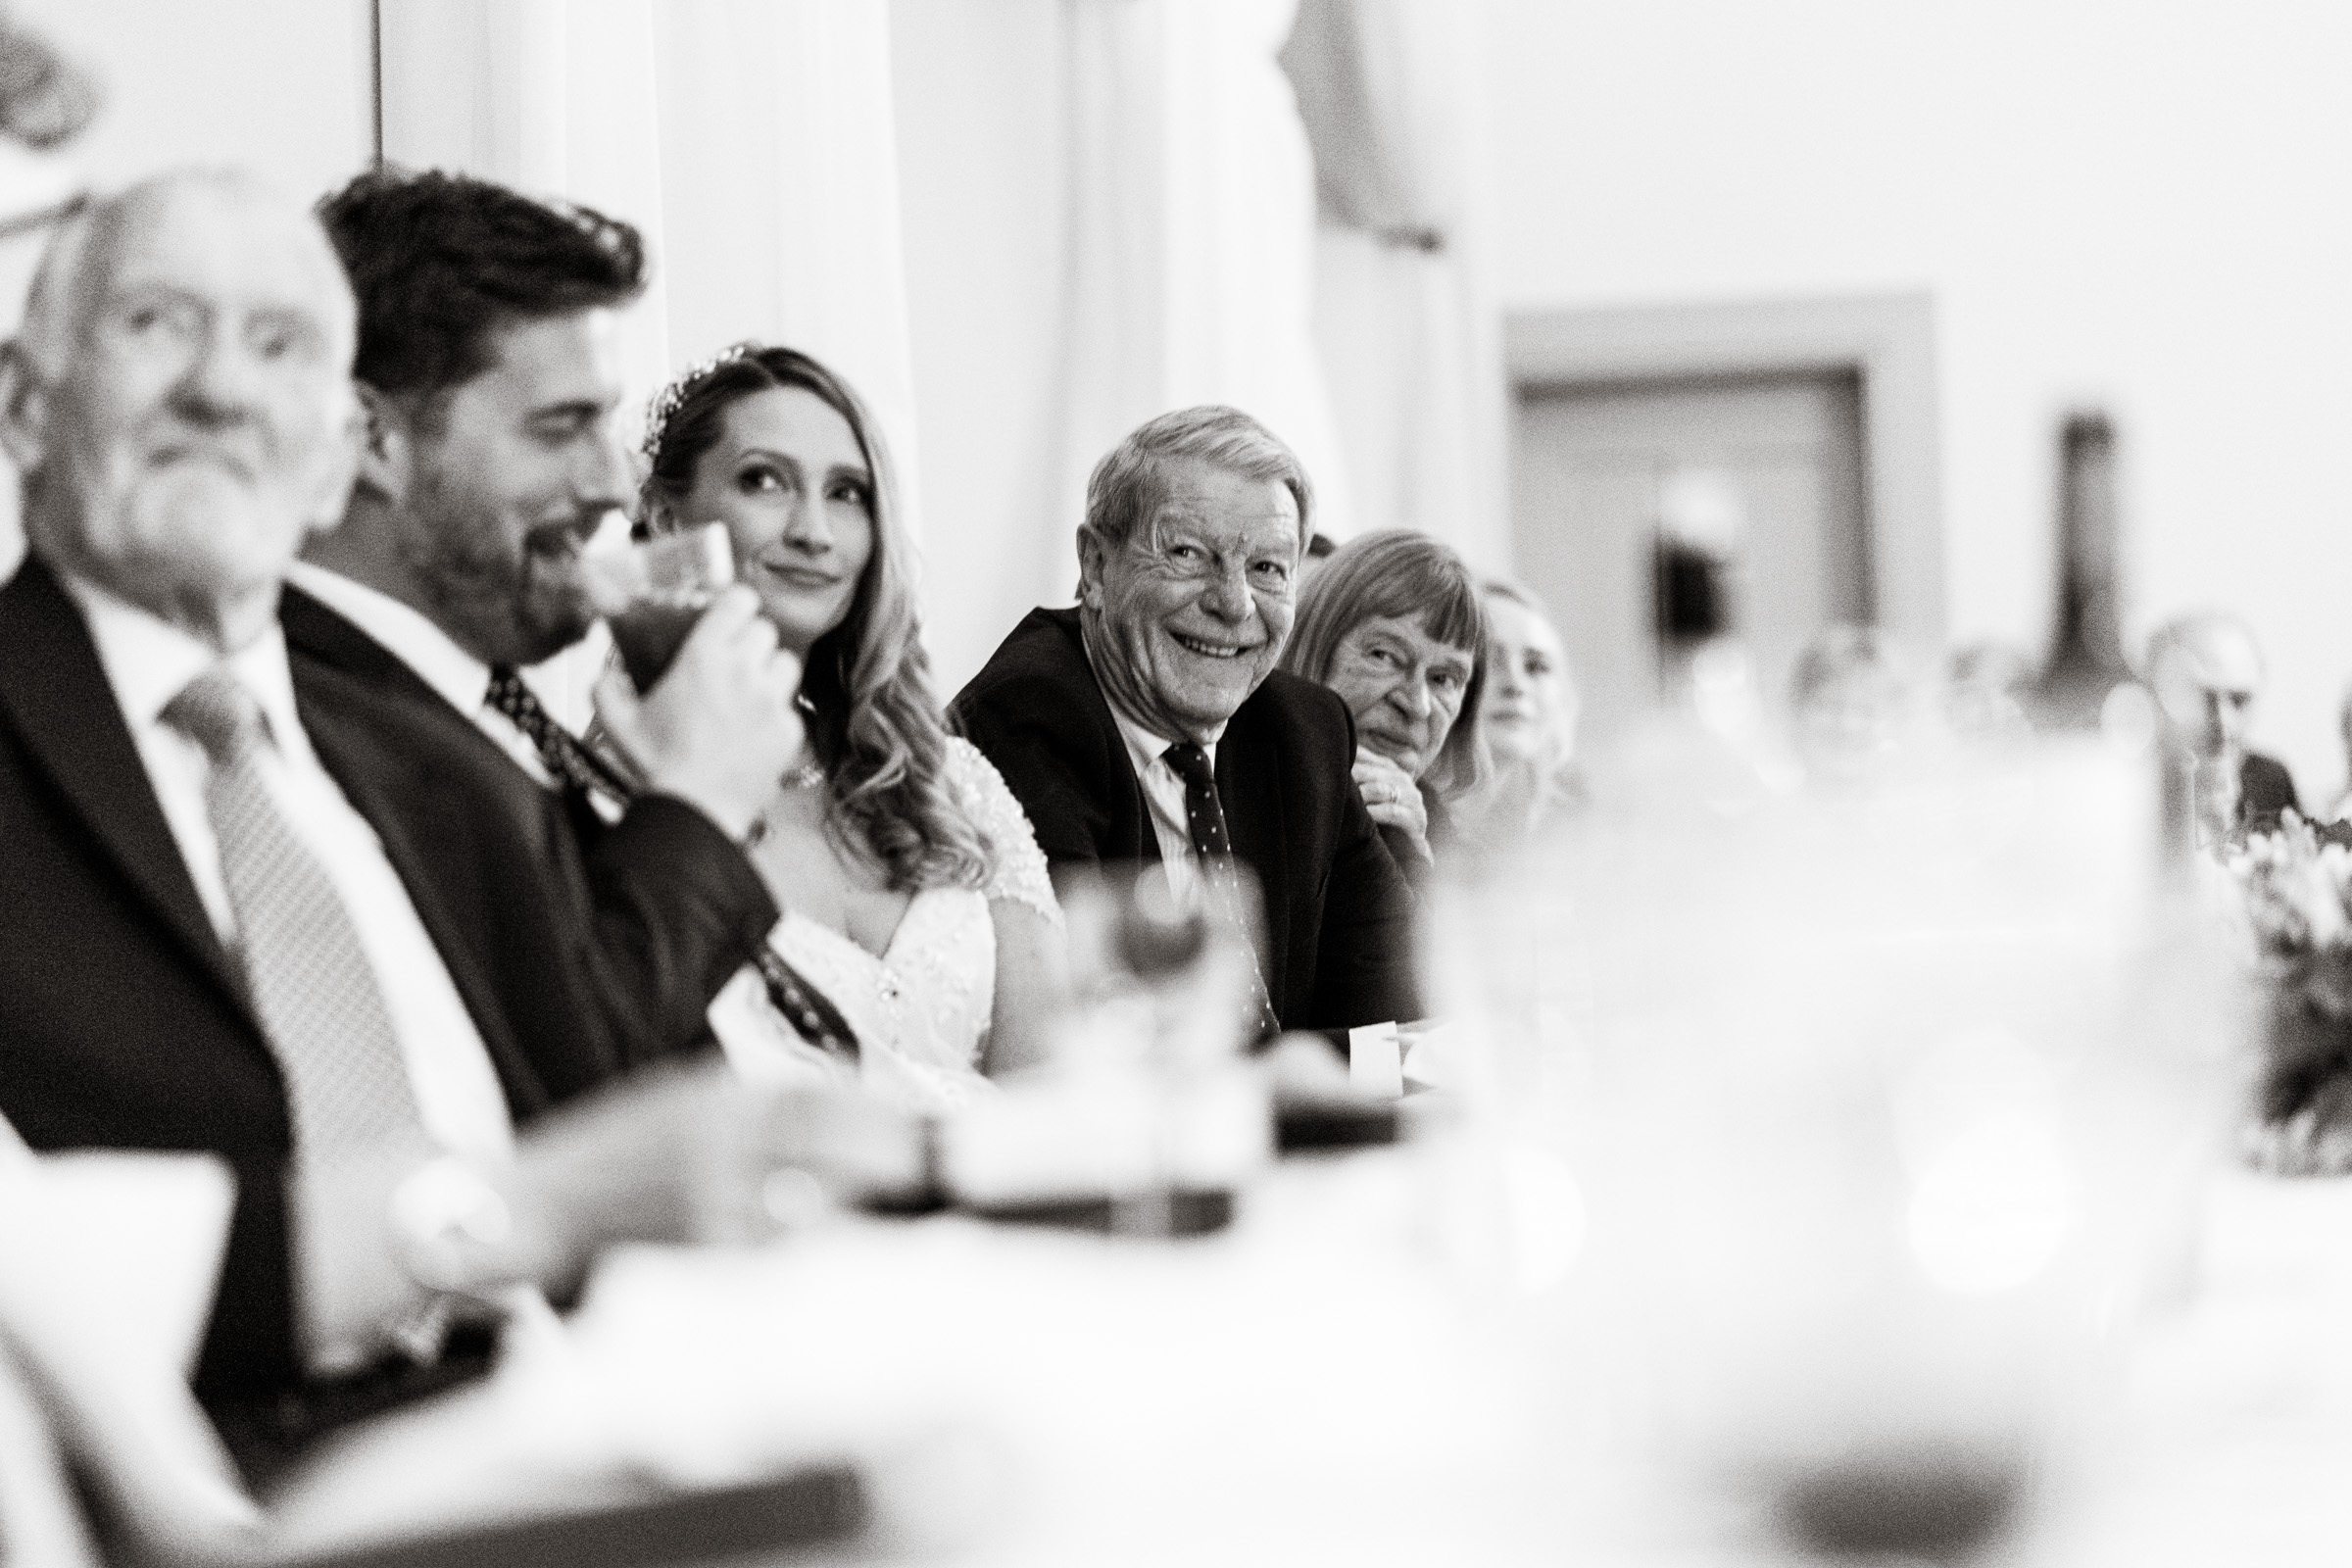 Brympton+House+Wedding+Photos+Somerset+079.jpg